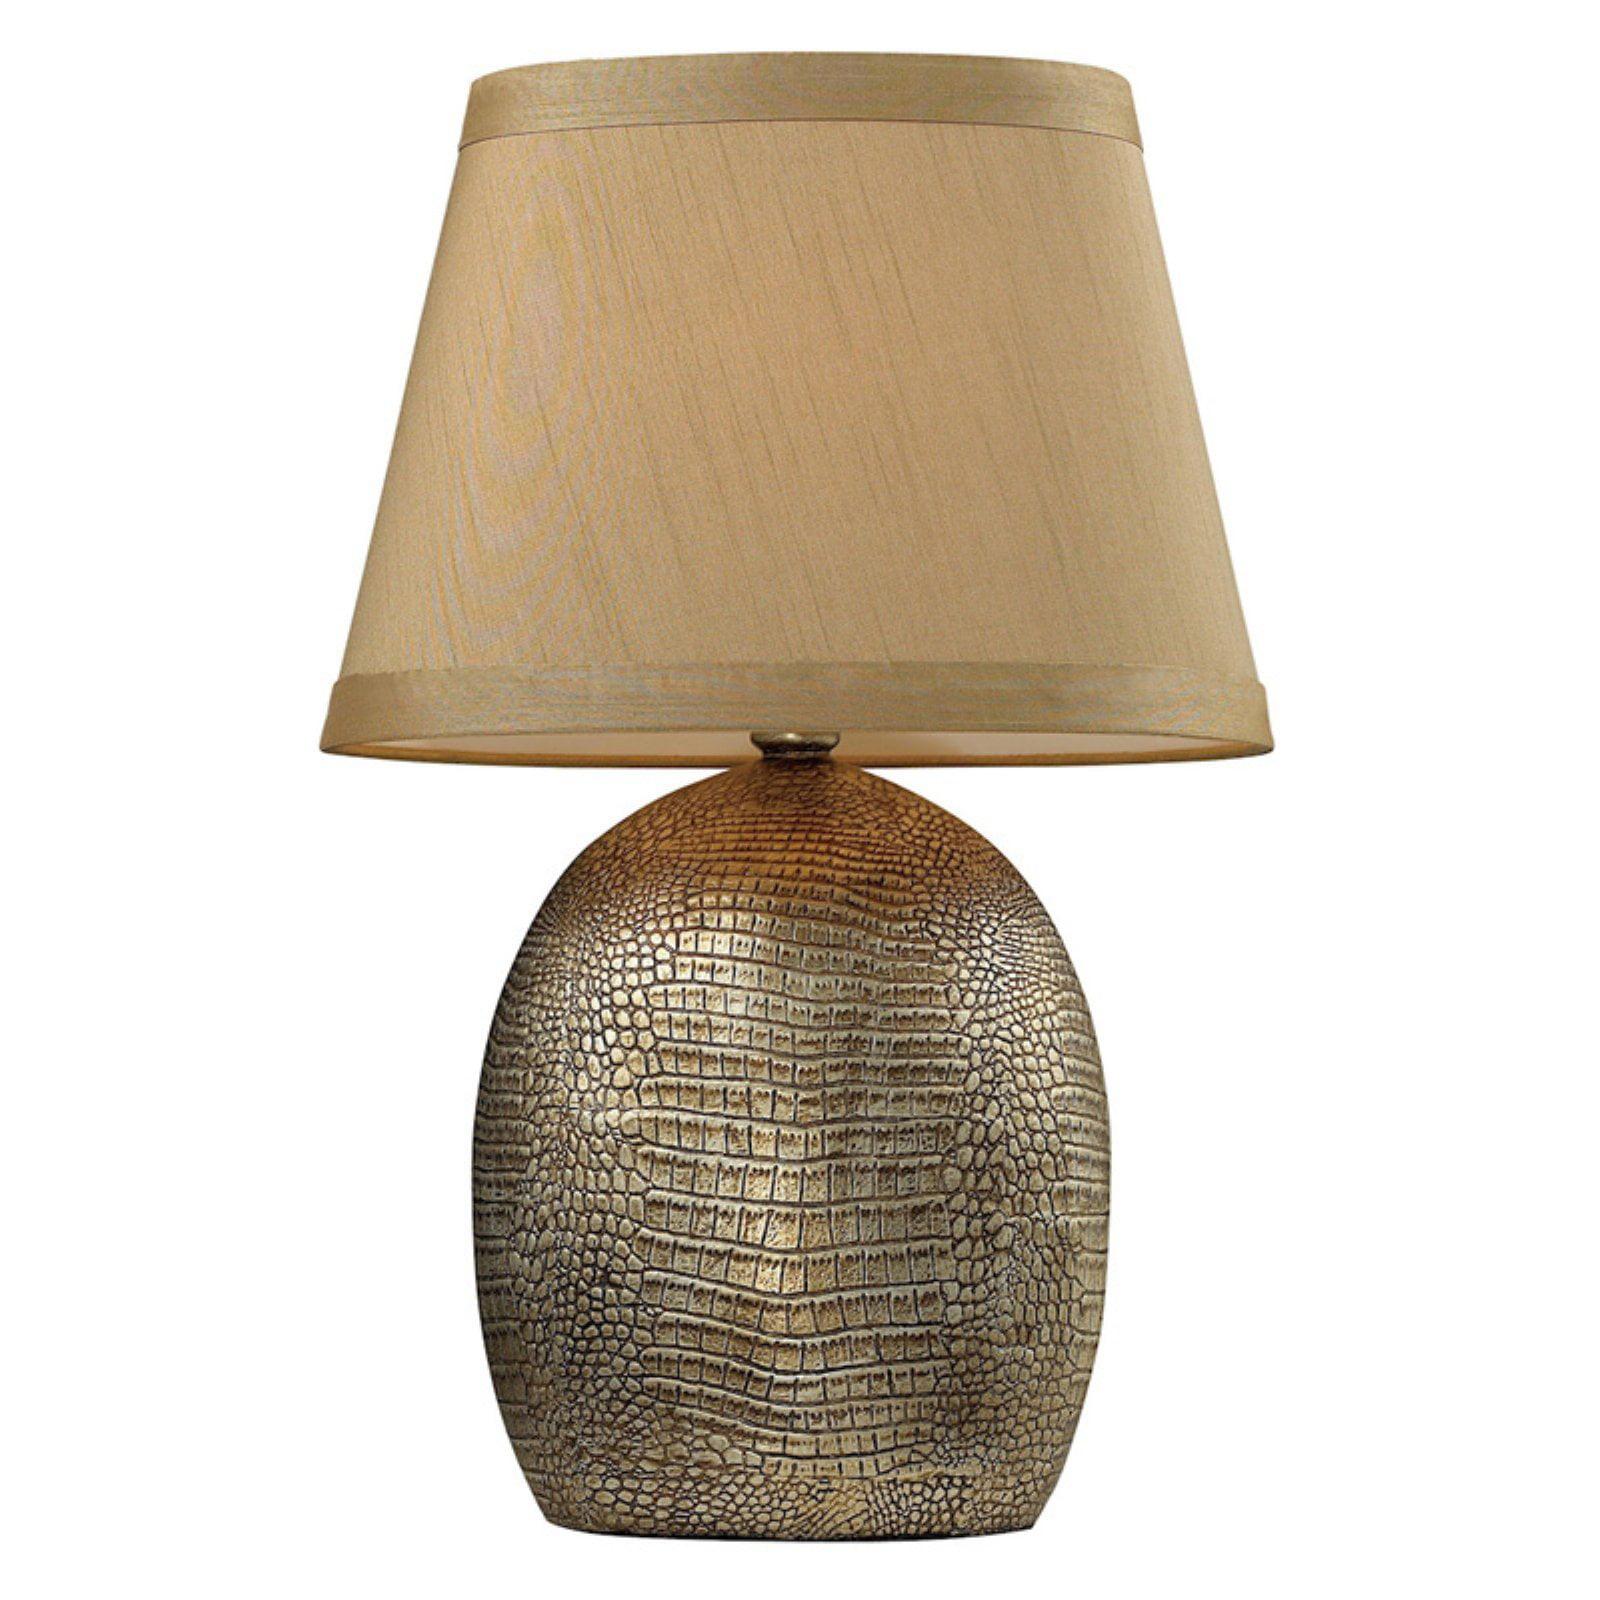 Dimond Lighting Gileaf Table Lamp